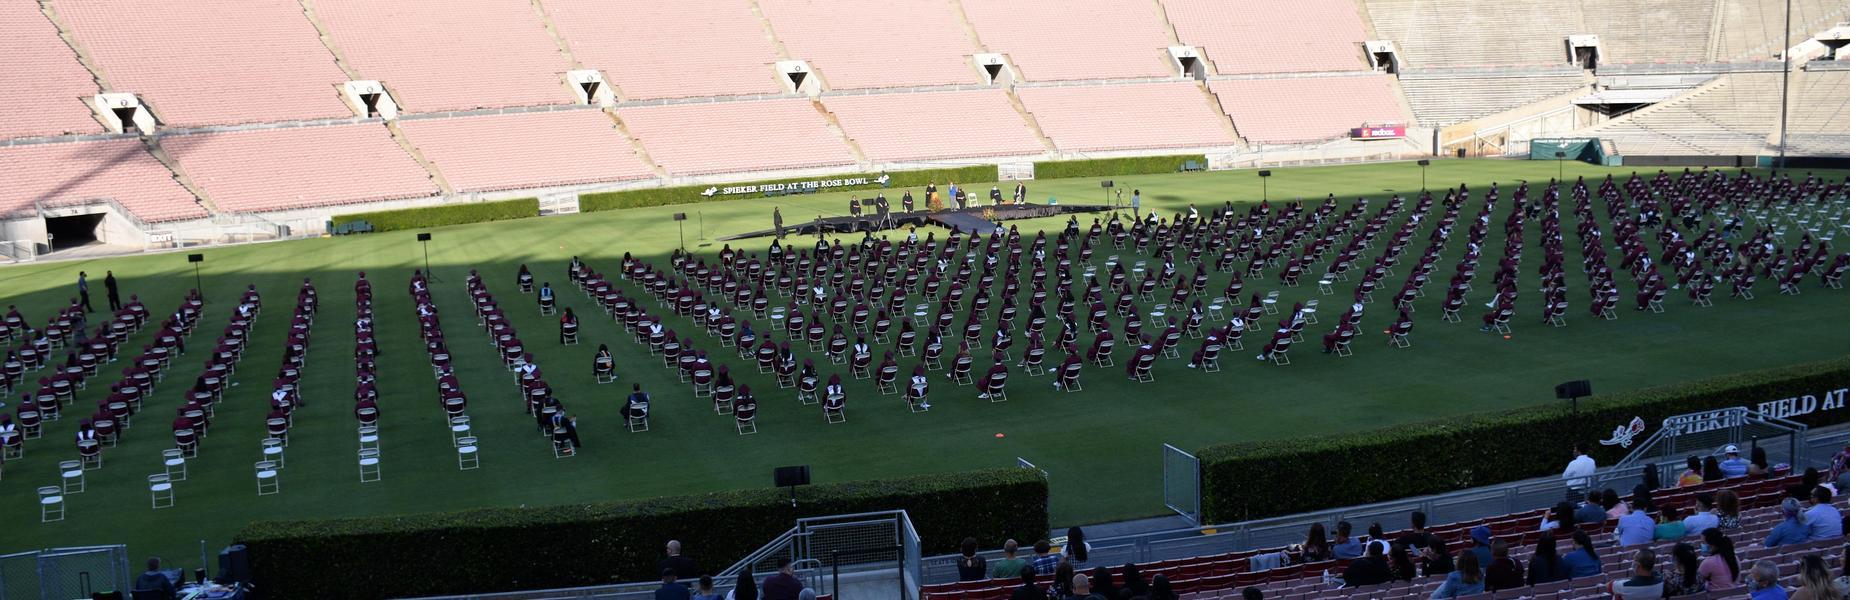 2021 Graduation at Rose Bowl Stadium